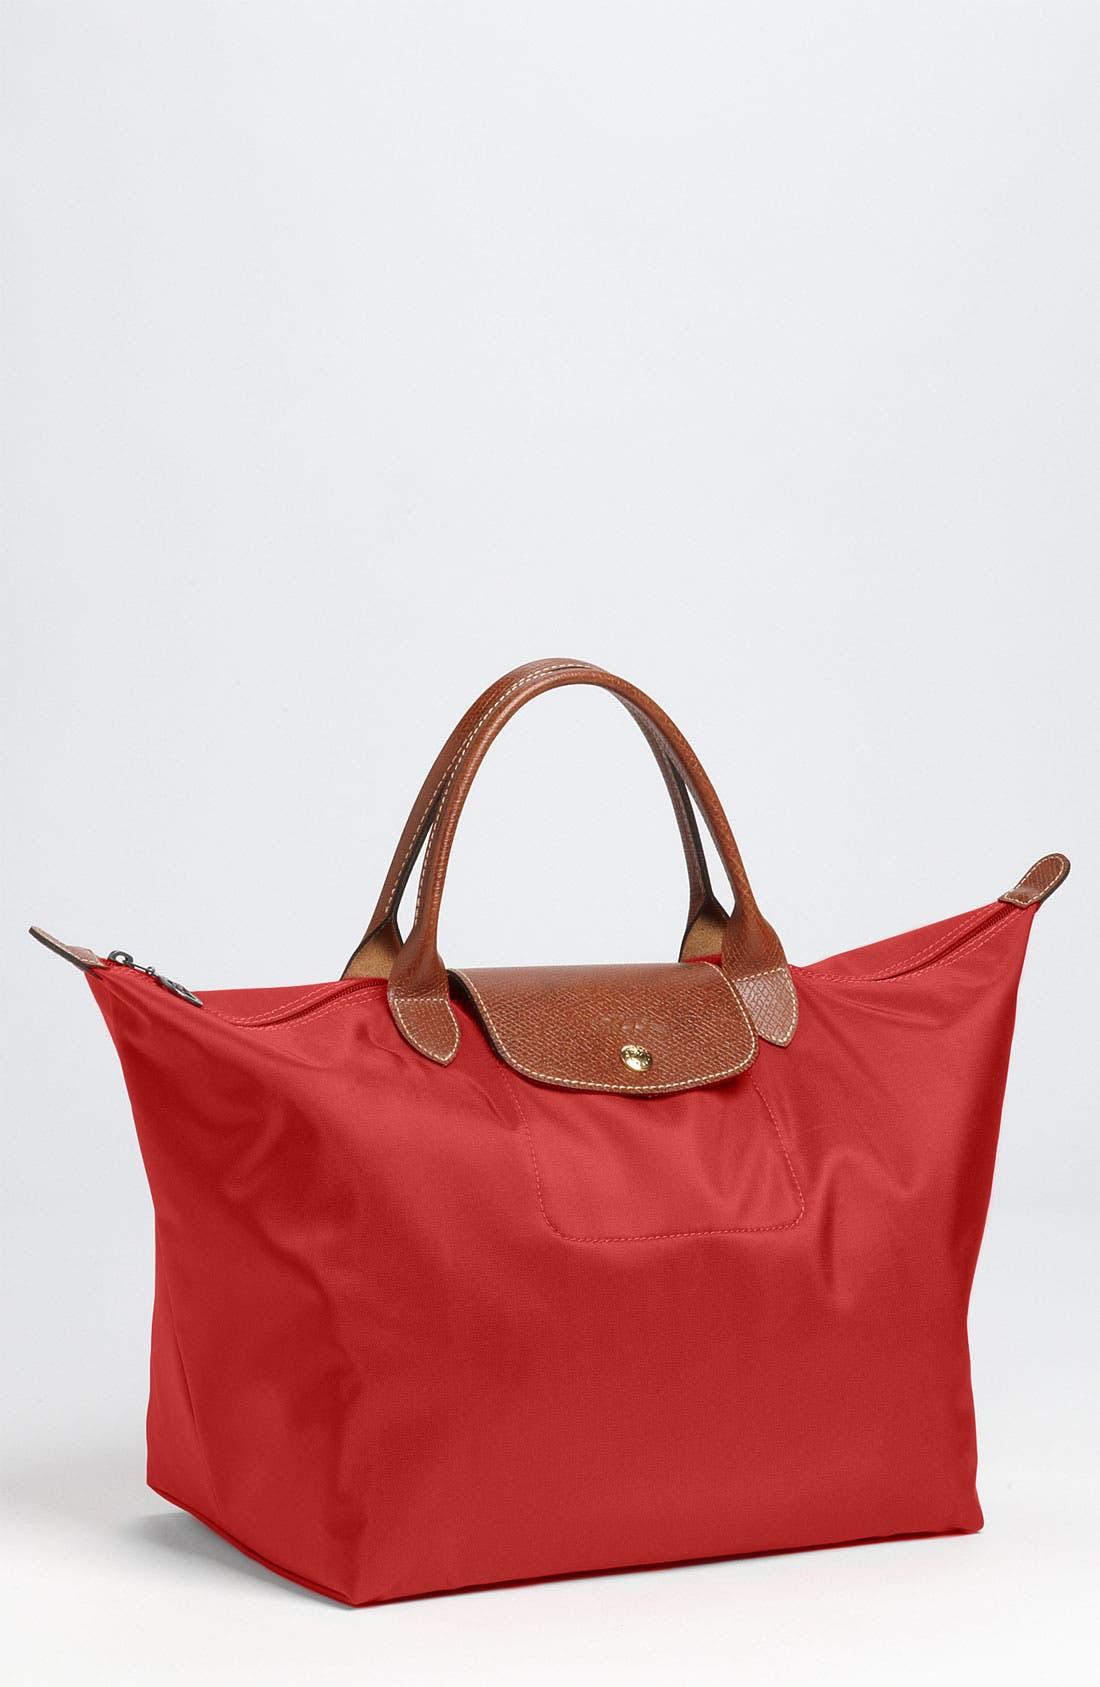 Longchamp 'Medium Le Pliage' Tote